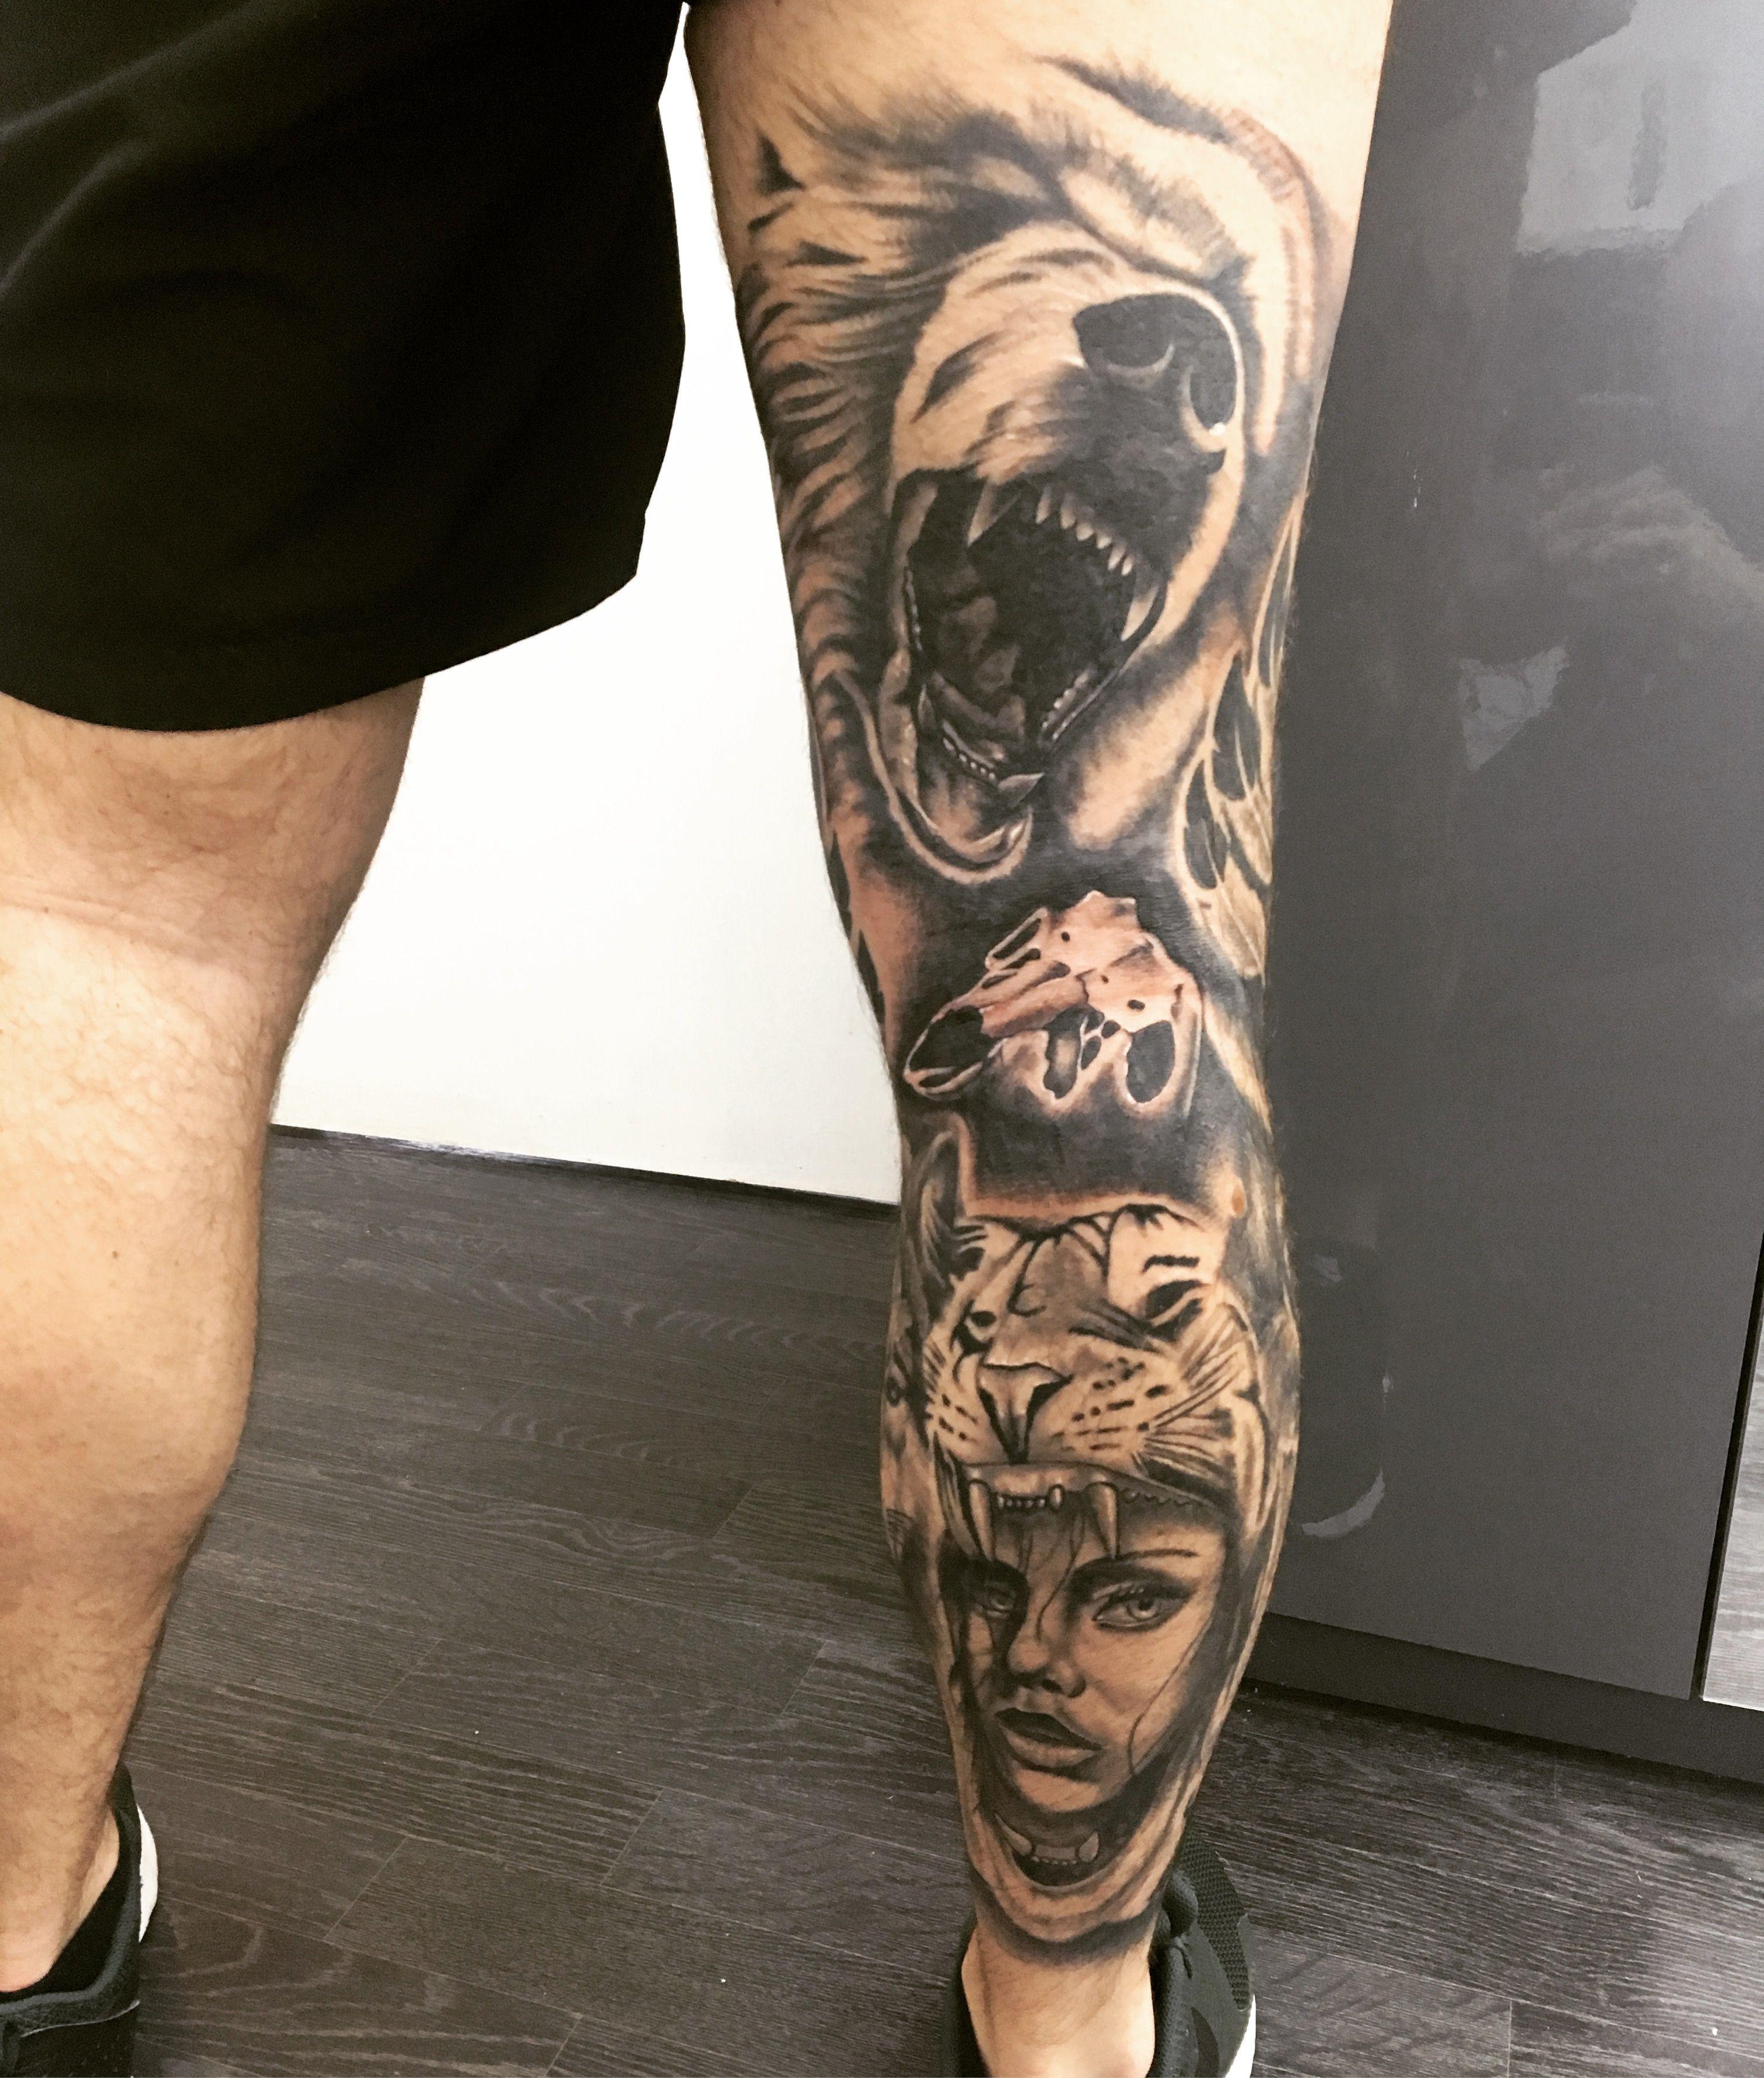 6cea87e61 Pin by Kelly Johnson on Bear tattoos | Tattoos, Bear tattoos, Tattoos for  guys